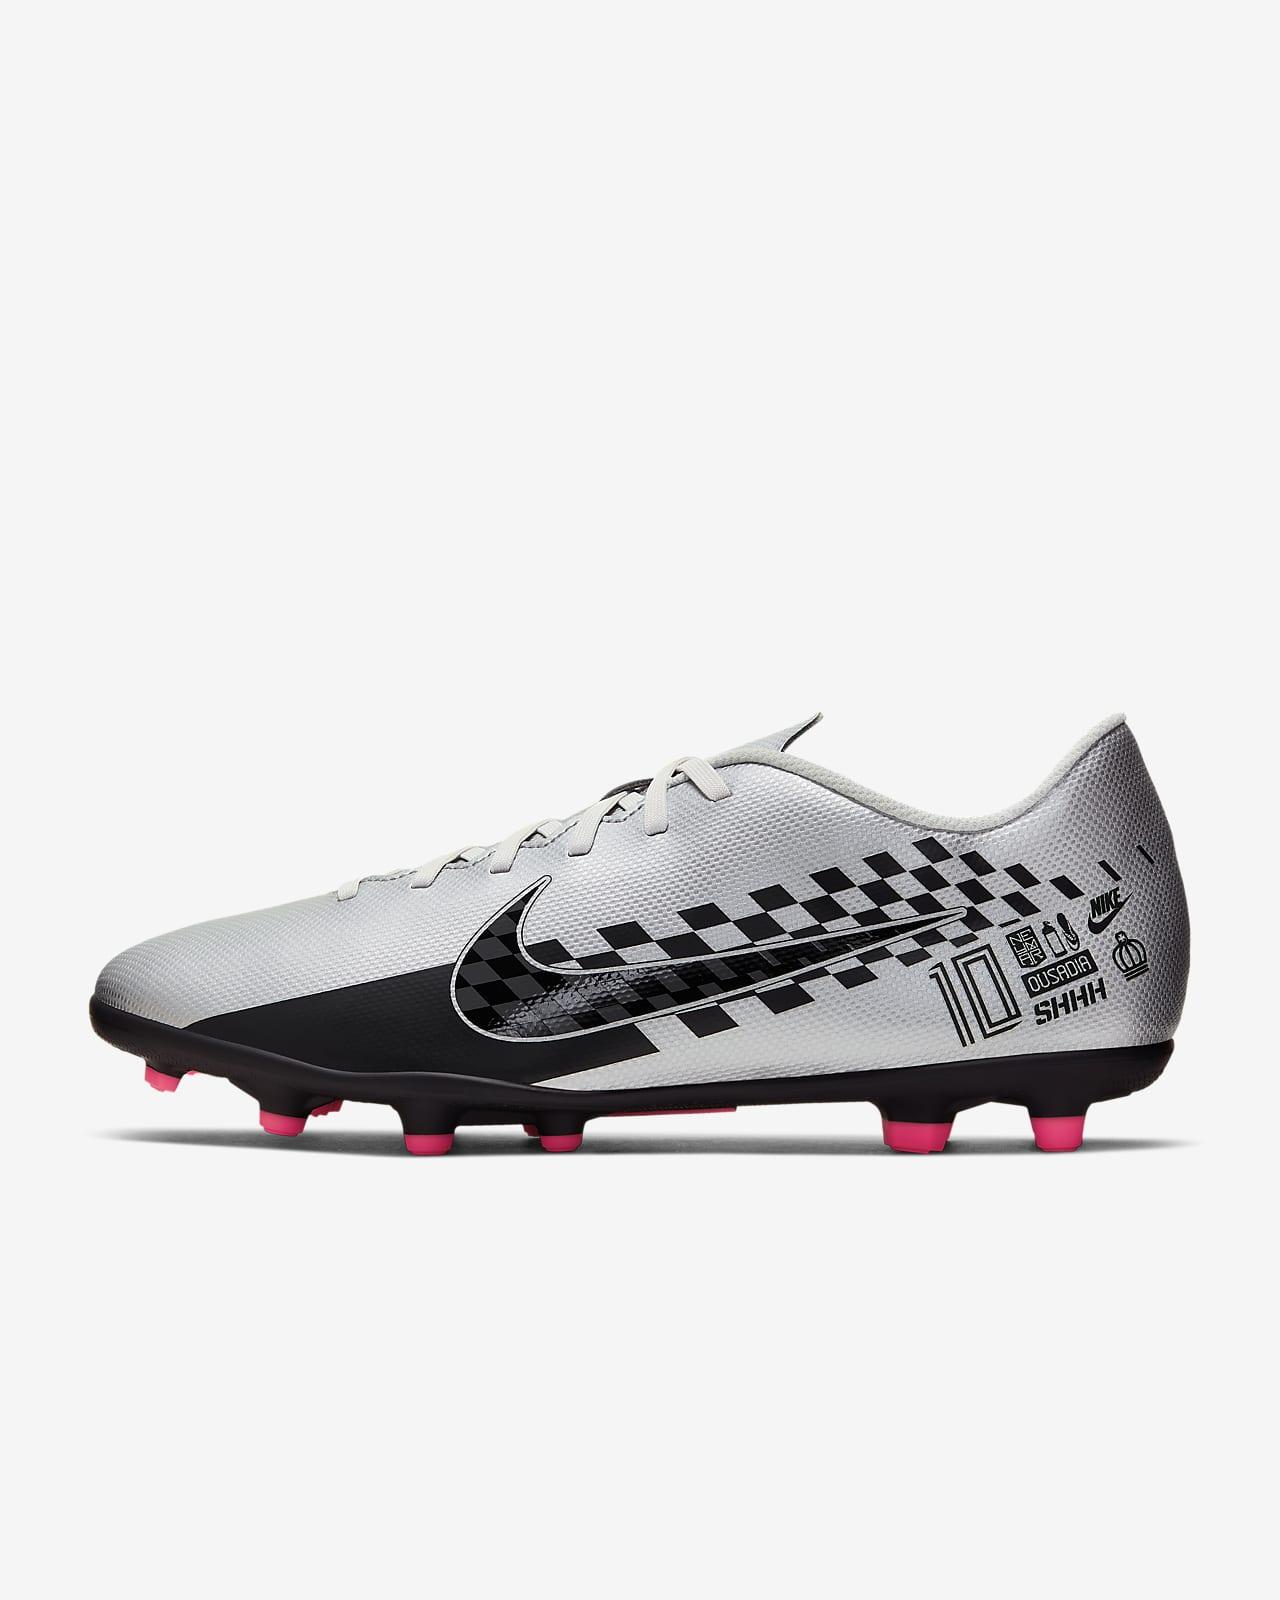 Nike Mercurial Vapor 13 Club Neymar Jr. MG Multi-Ground Football Boot